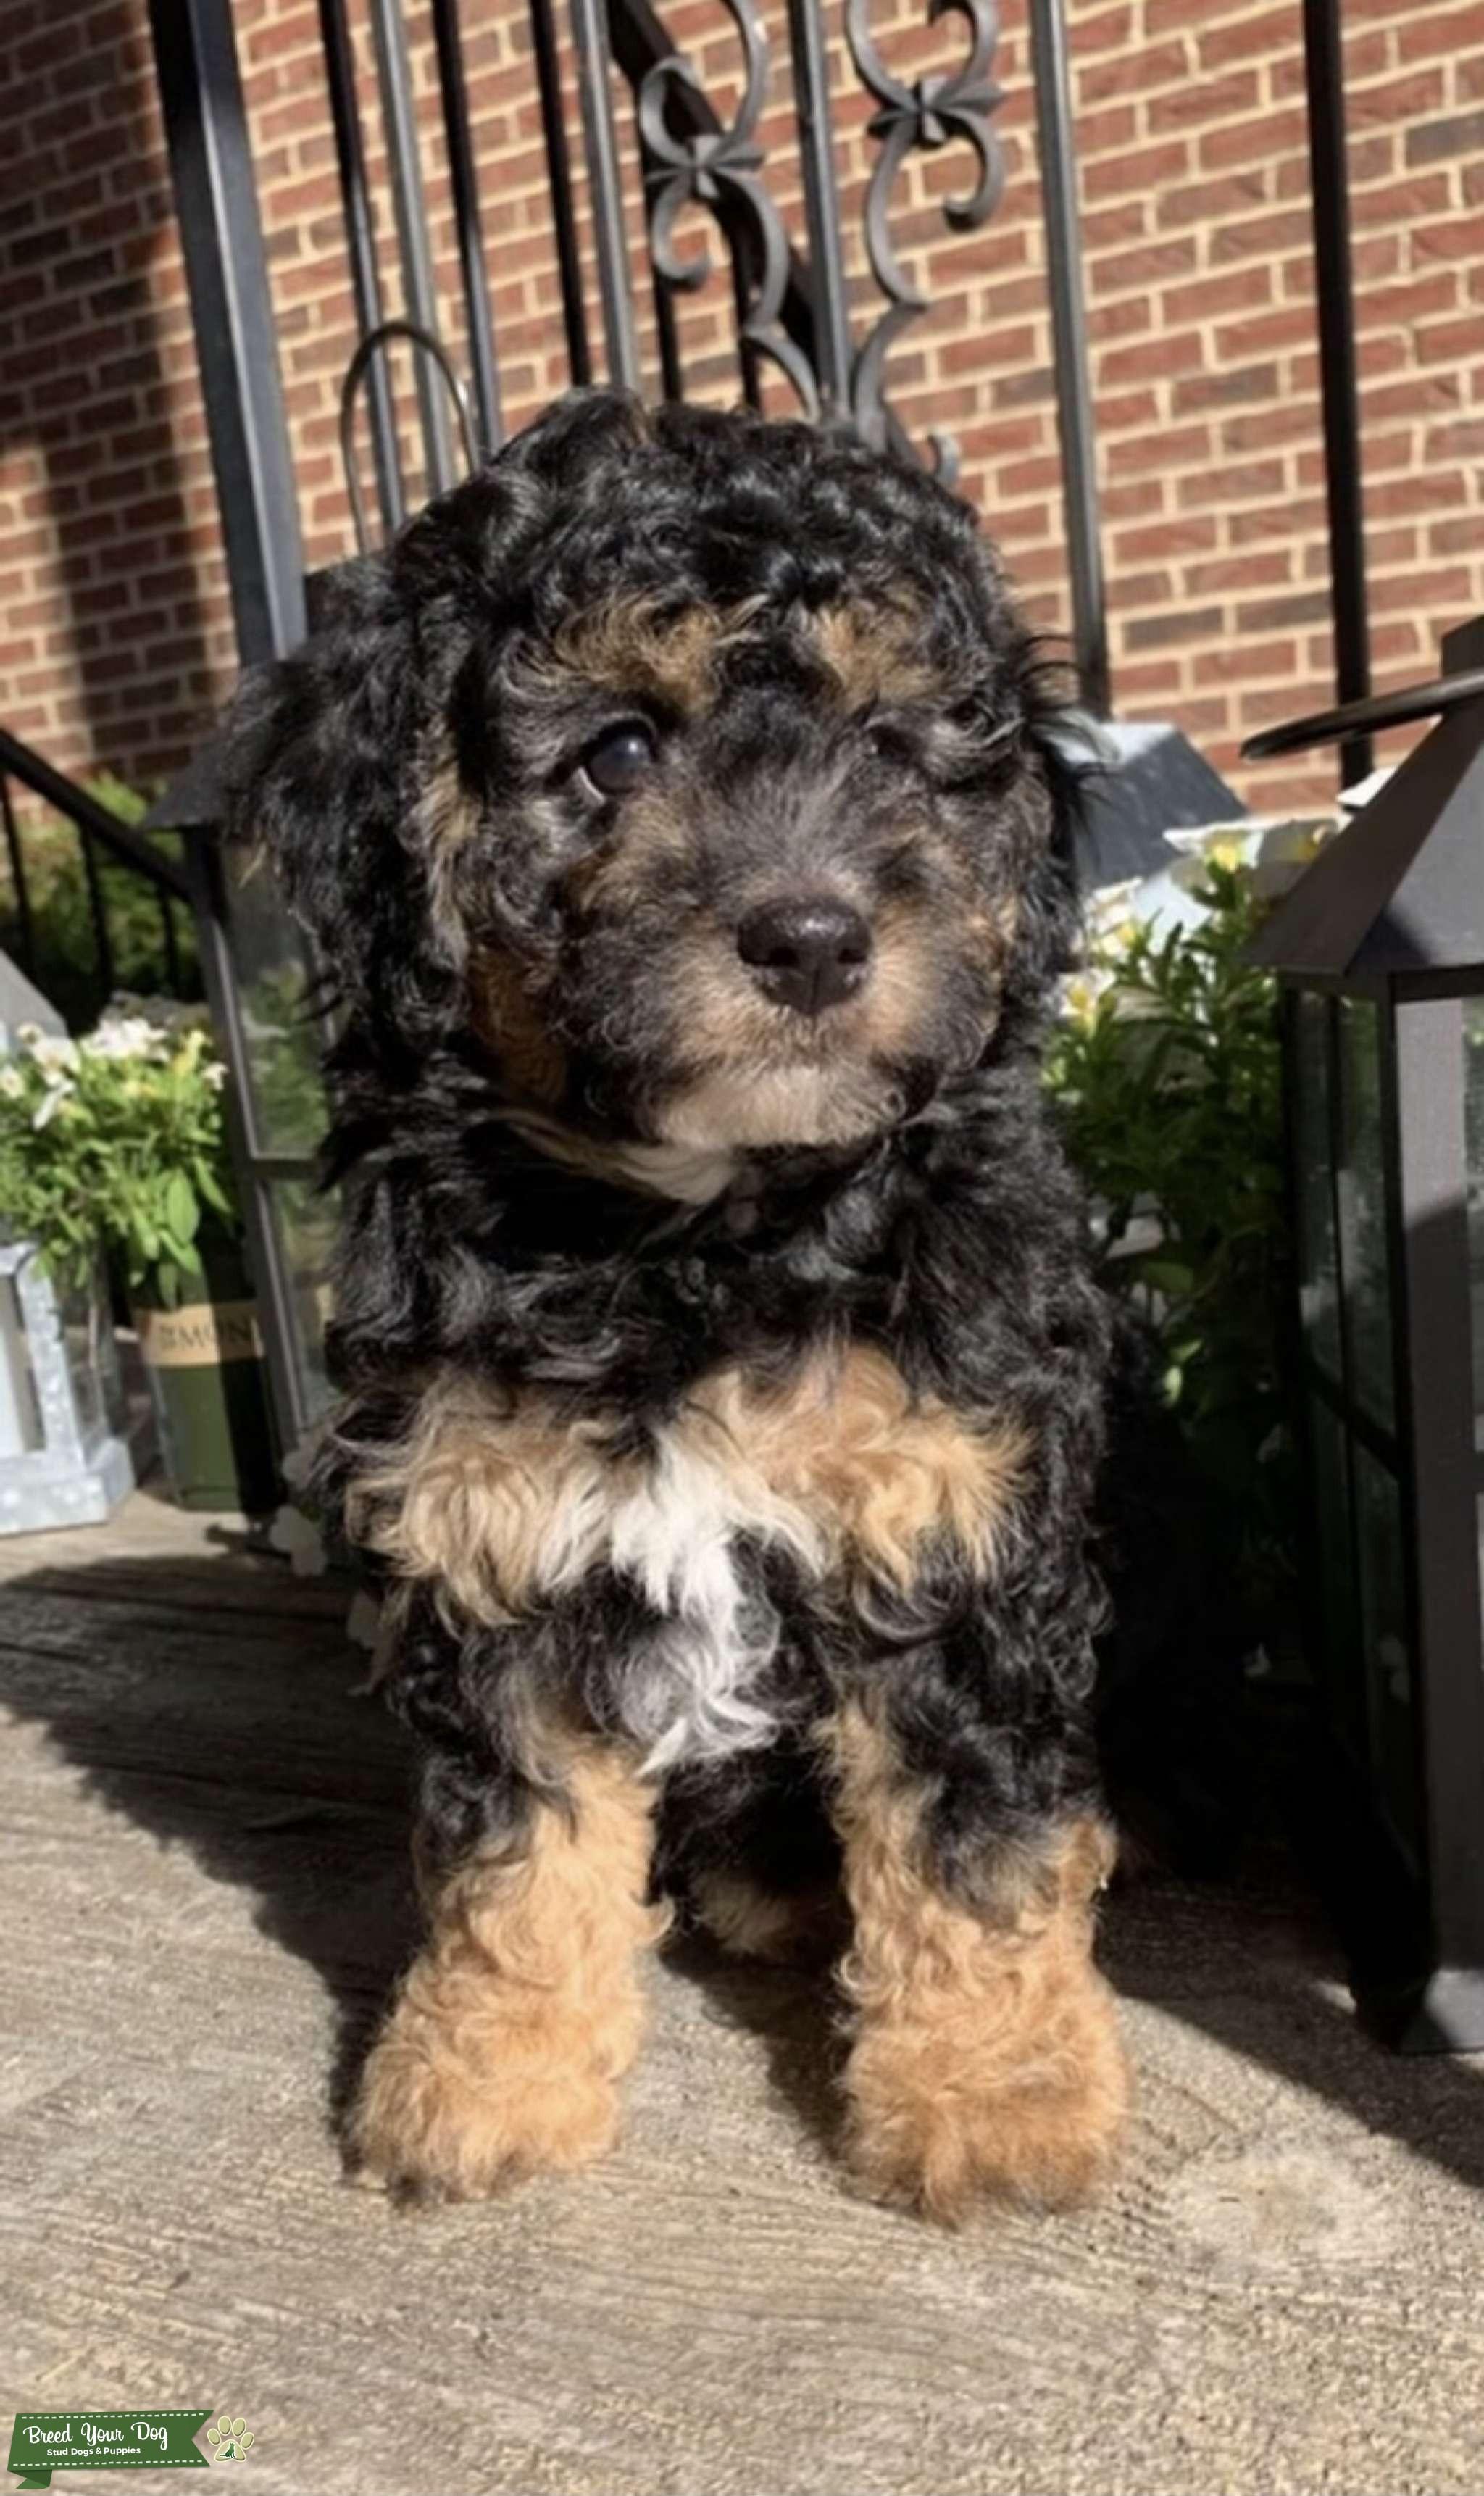 AKC Miniature Phantom Poodle for Stud(PROVEN) Listing Image Big